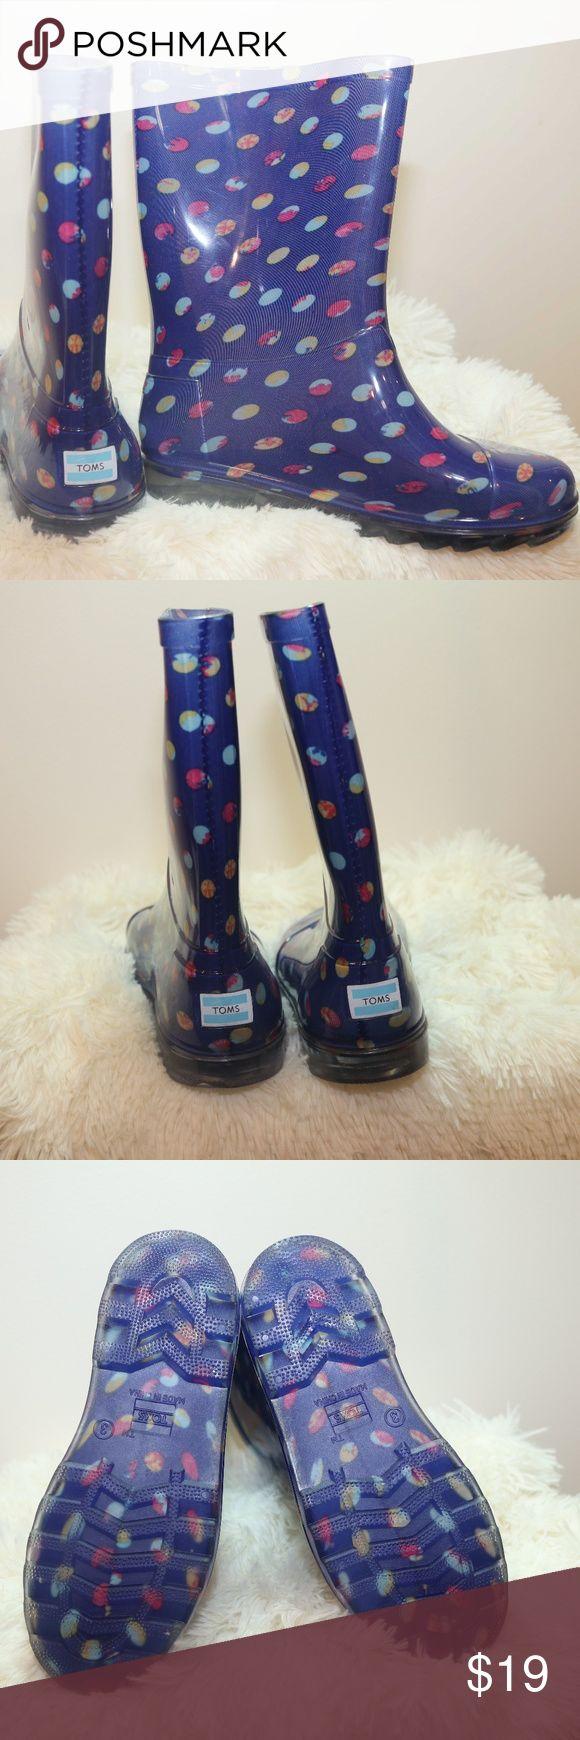 Tom's Rain Kids Rain boot Sz Y3 Beautiful Tom's Kids Rain boot Sz Y3 Price reflects one missing foot insert toms Shoes Rain & Snow Boots